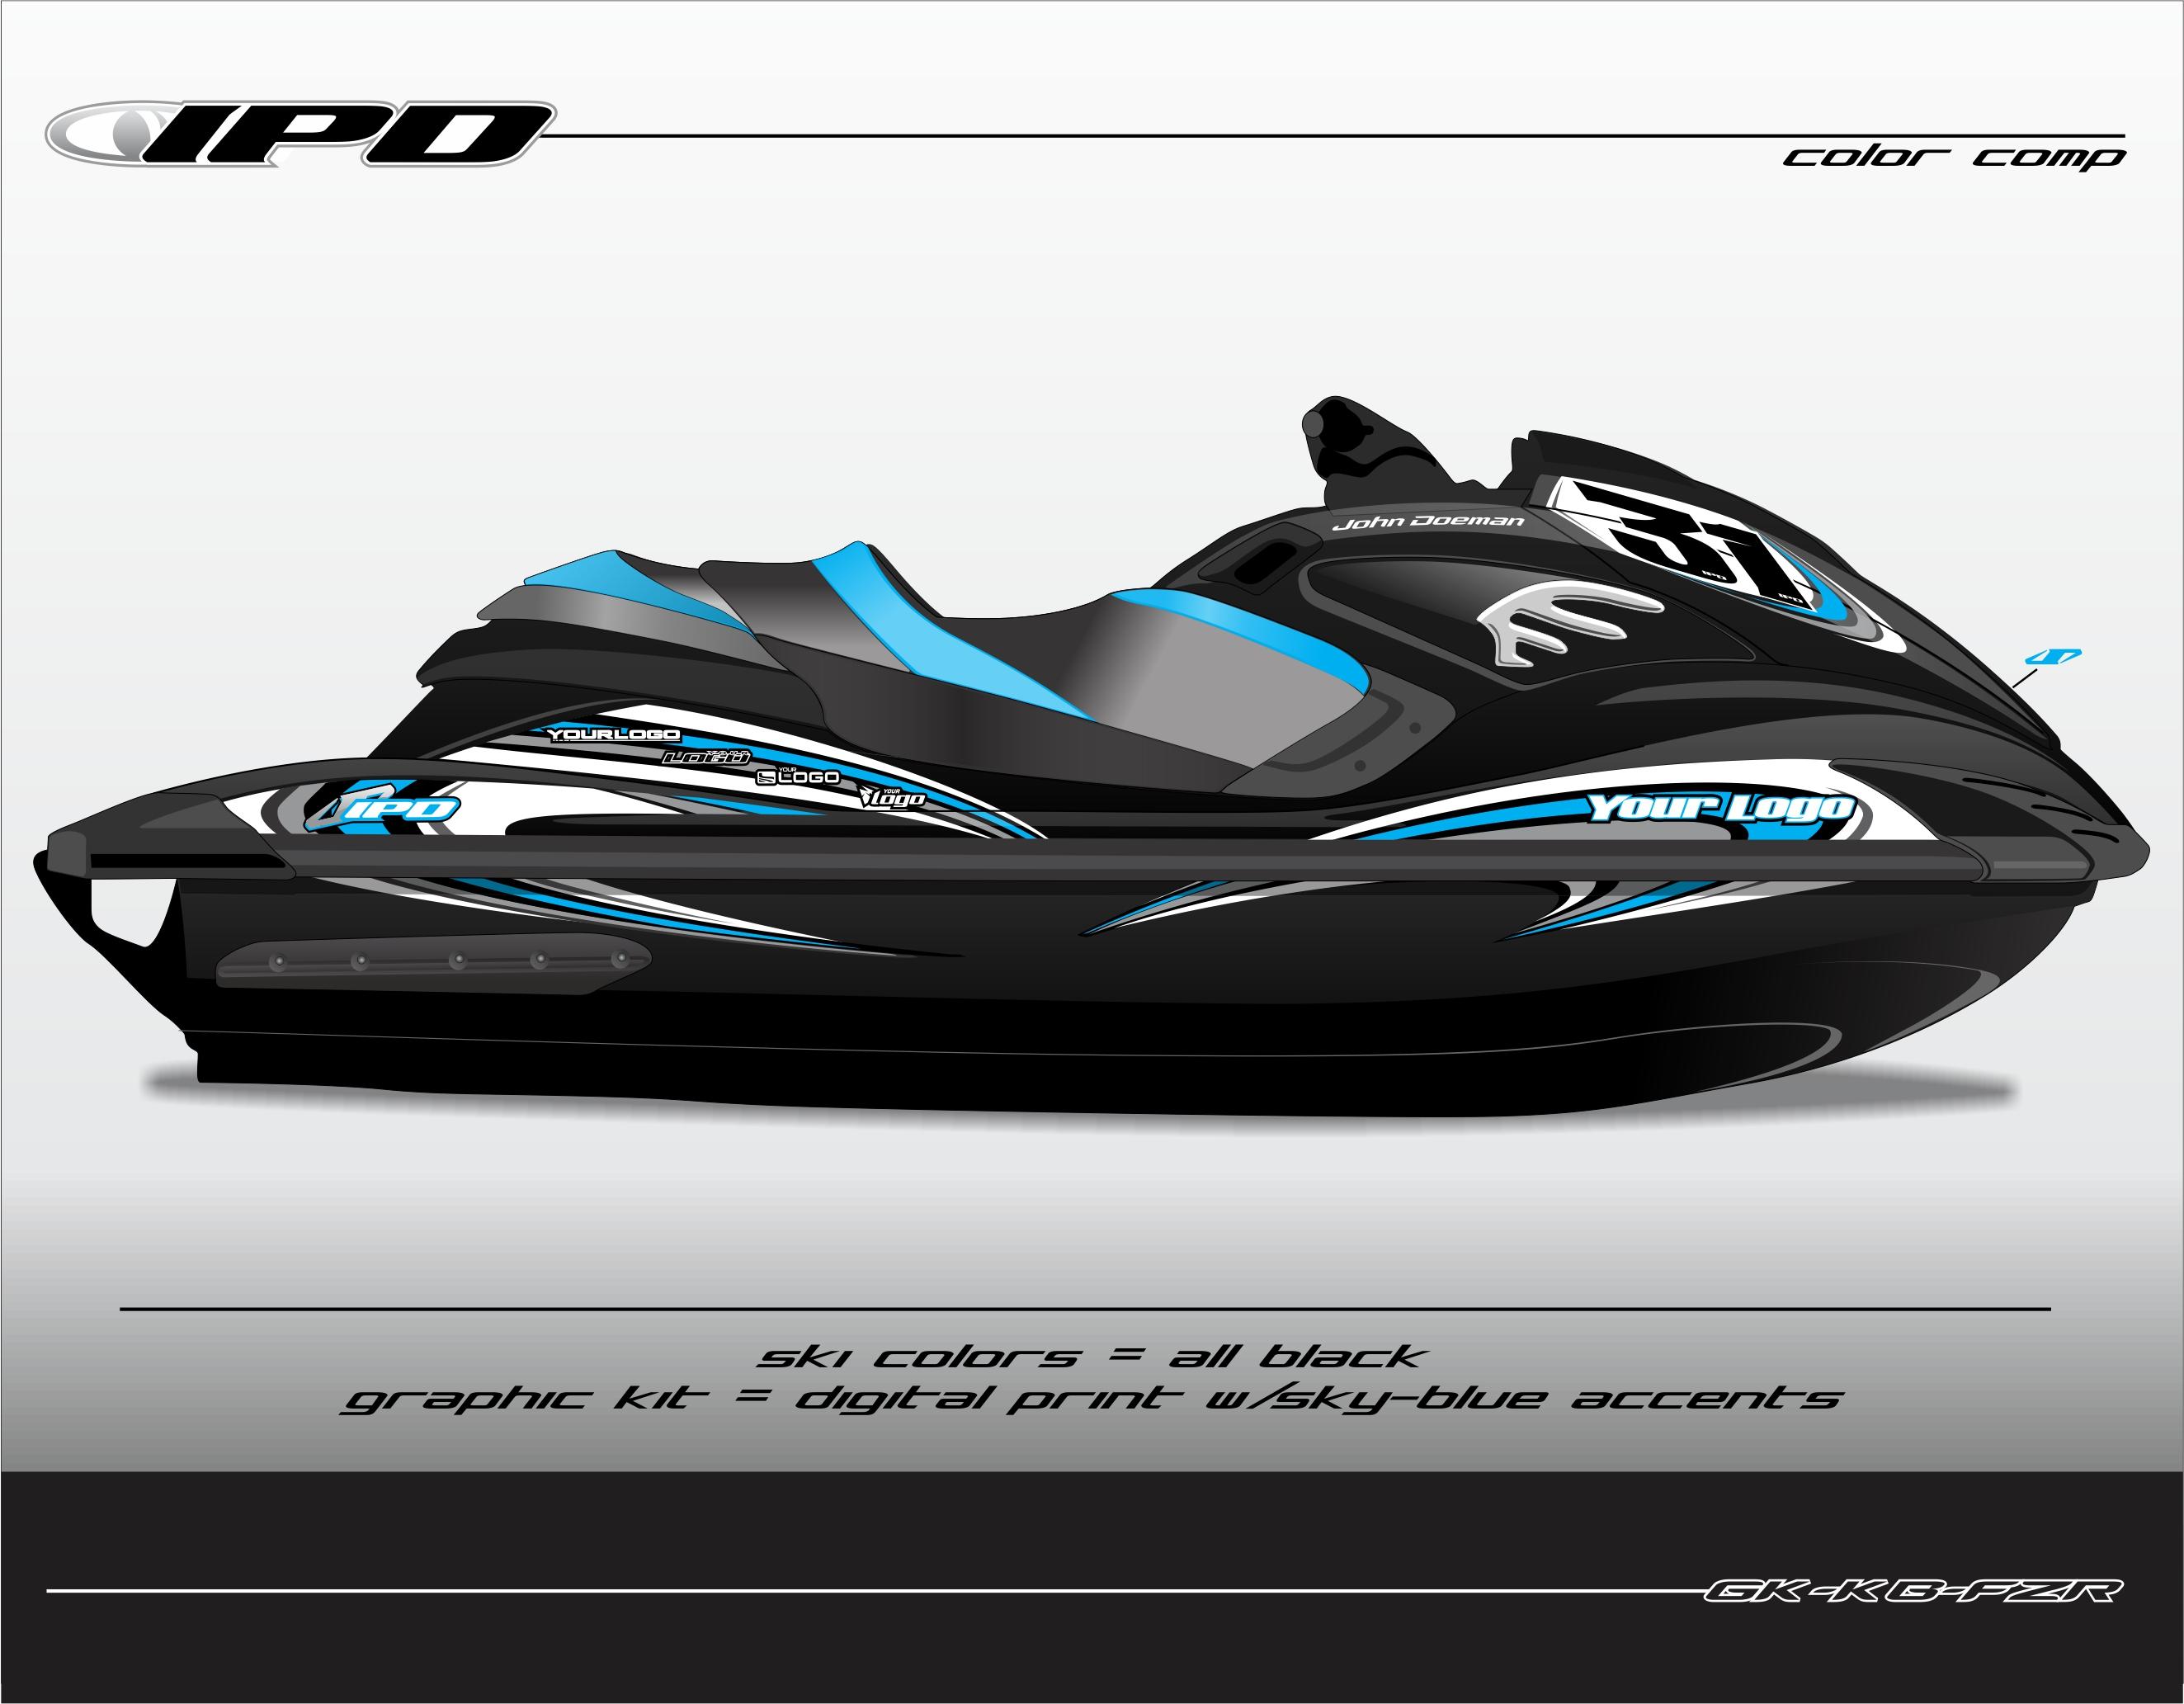 yamaha fzs fzr graphics kit kb design ipd jet ski. Black Bedroom Furniture Sets. Home Design Ideas